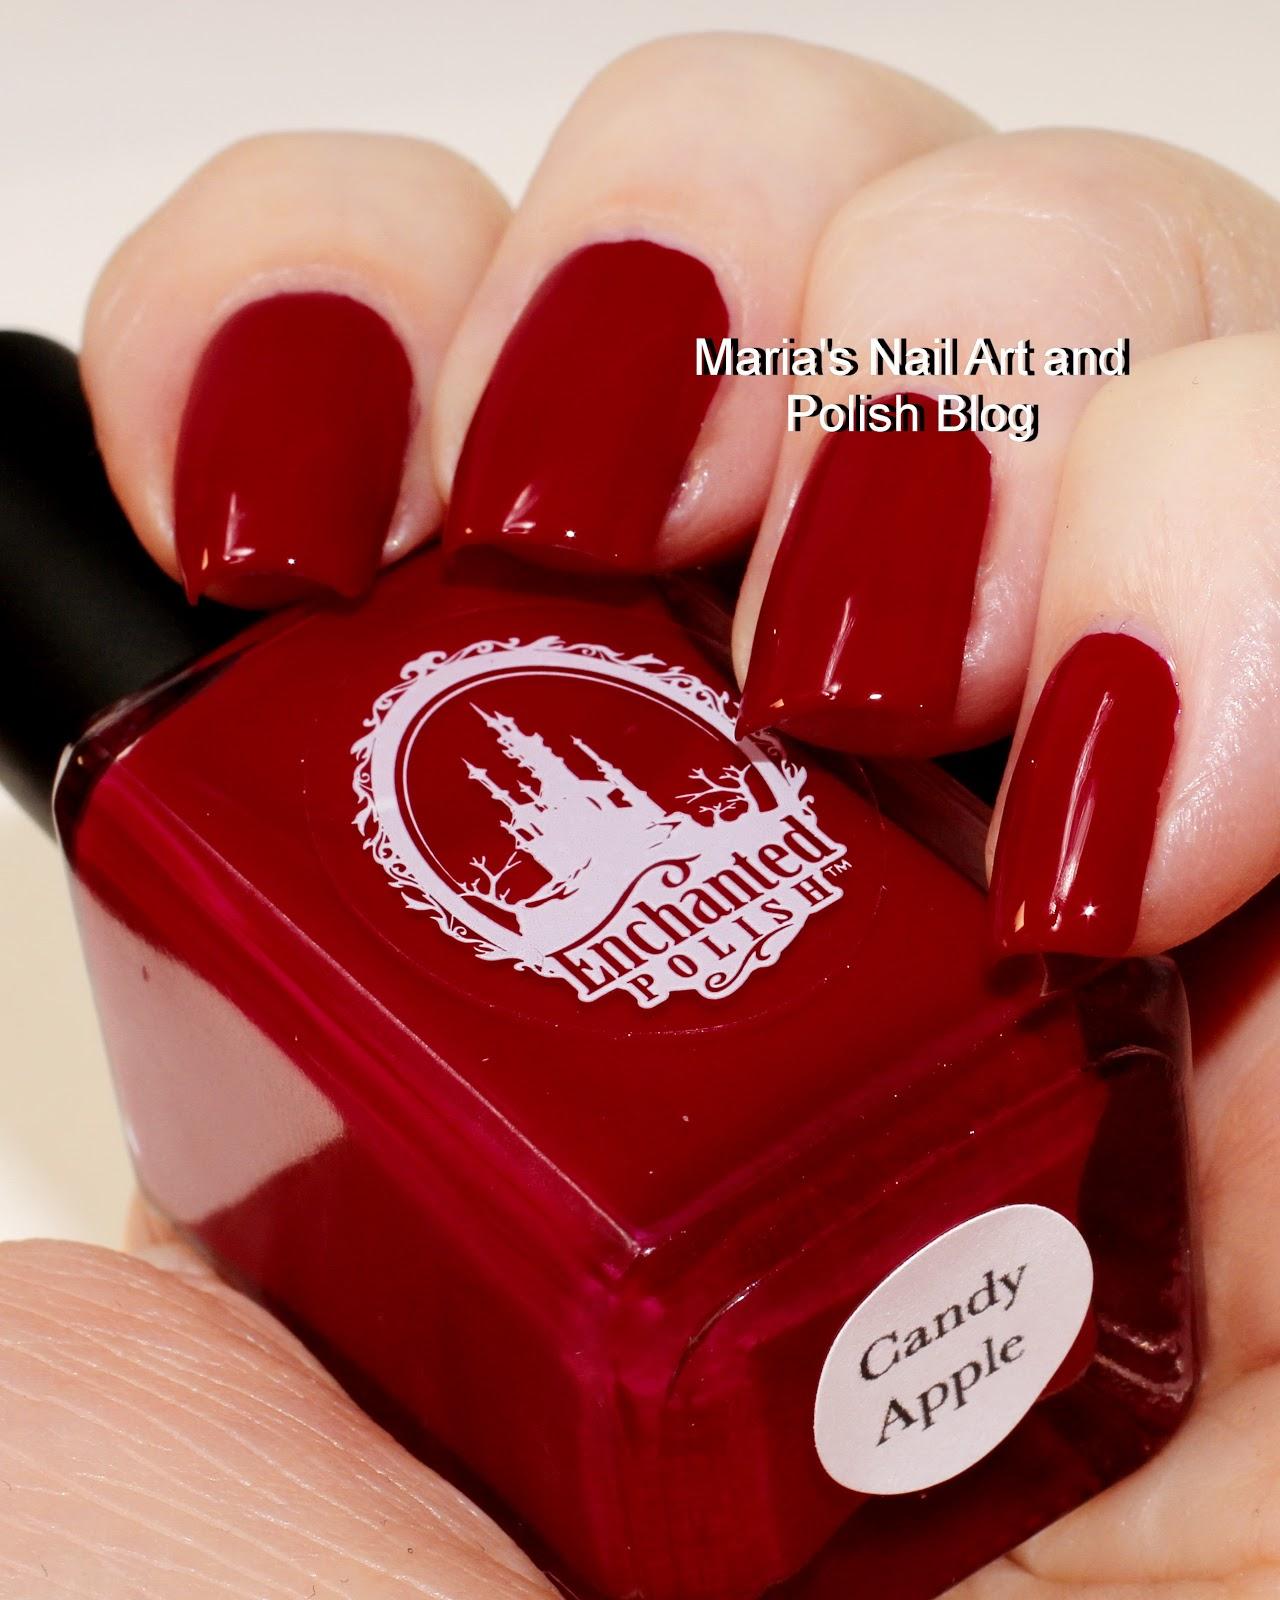 Marias Nail Art And Polish Blog Flushed With Stripes And: Marias Nail Art And Polish Blog: Enchanted Polish Candy